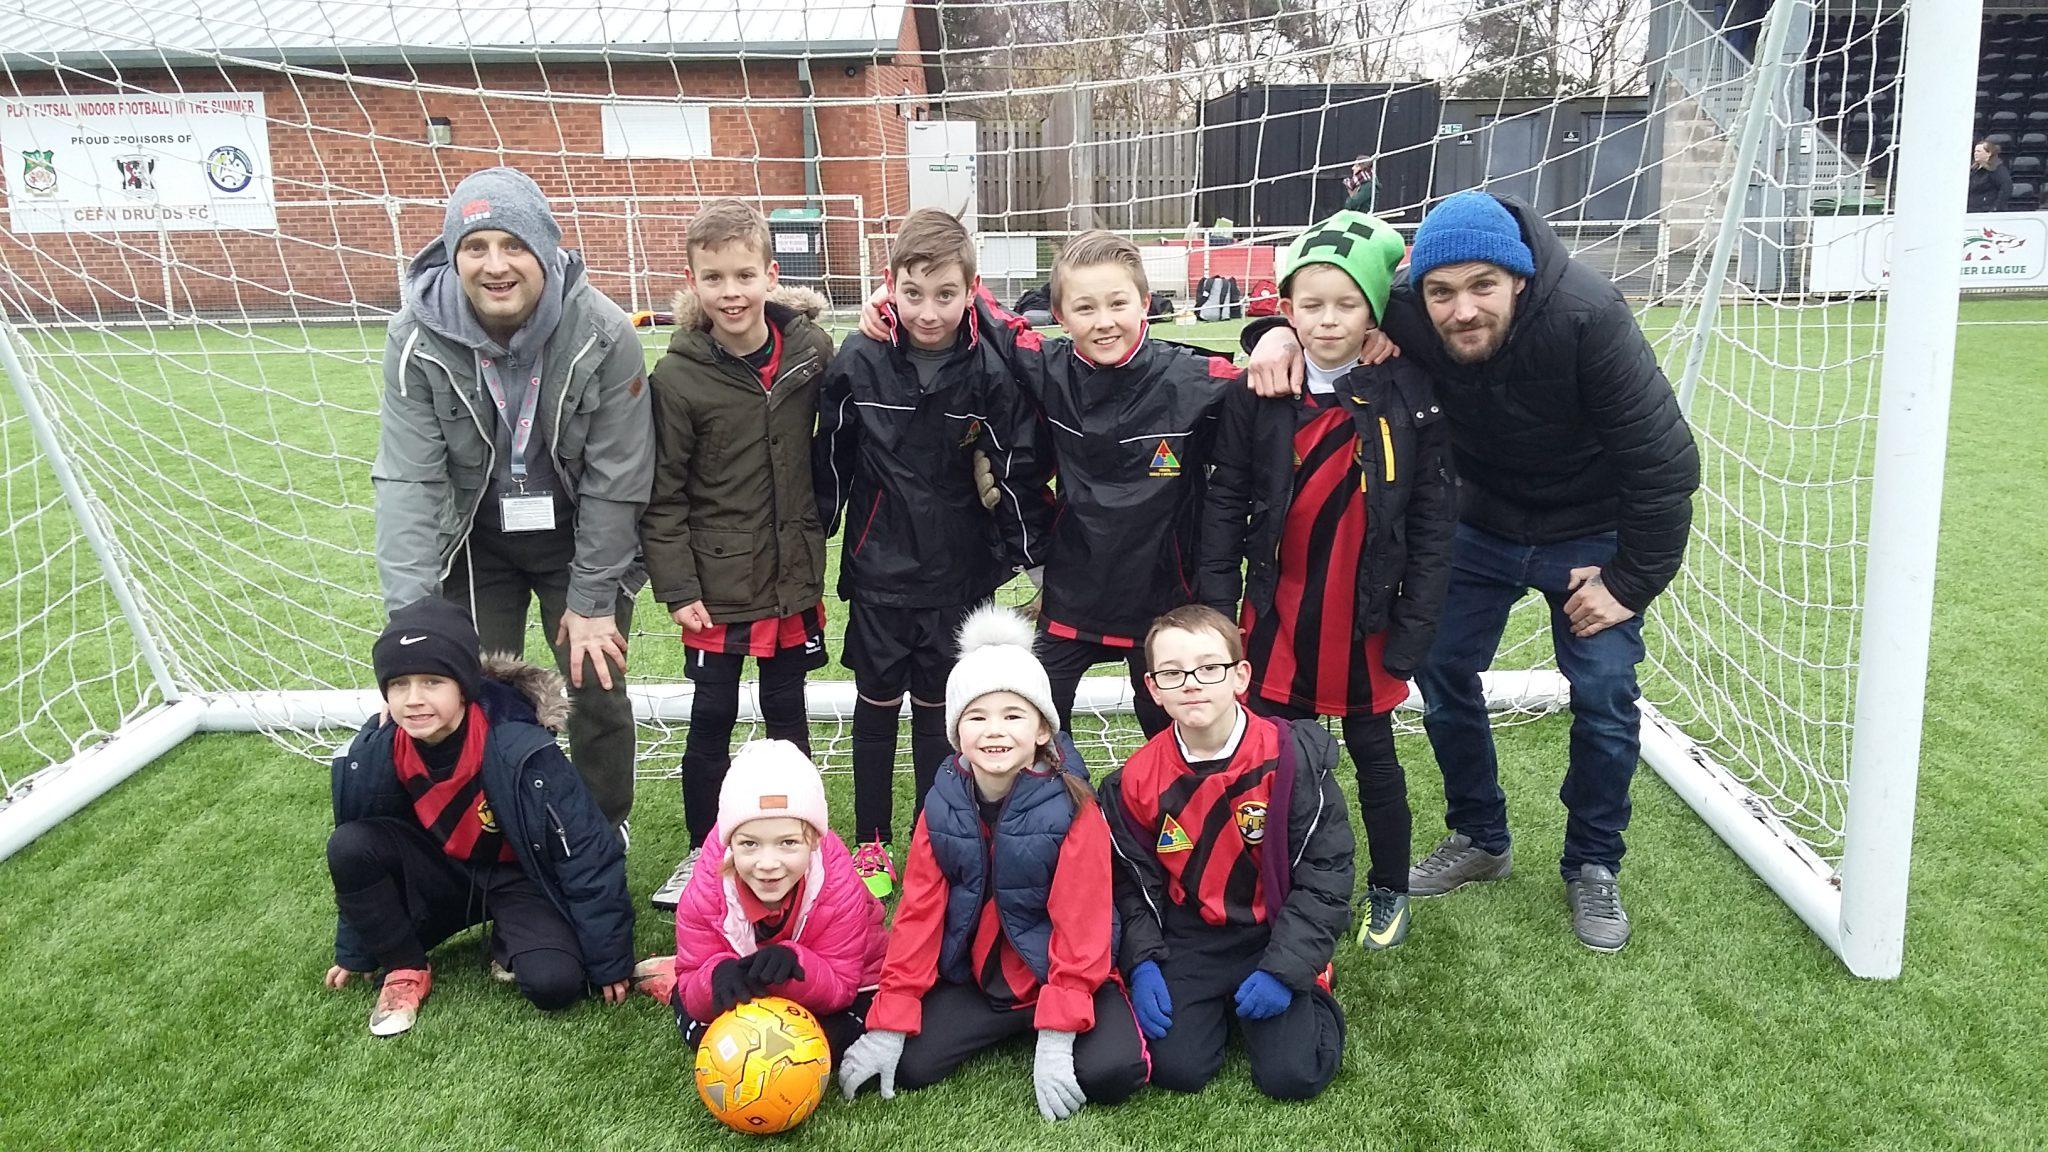 Year 4 Football Cefn Druids: